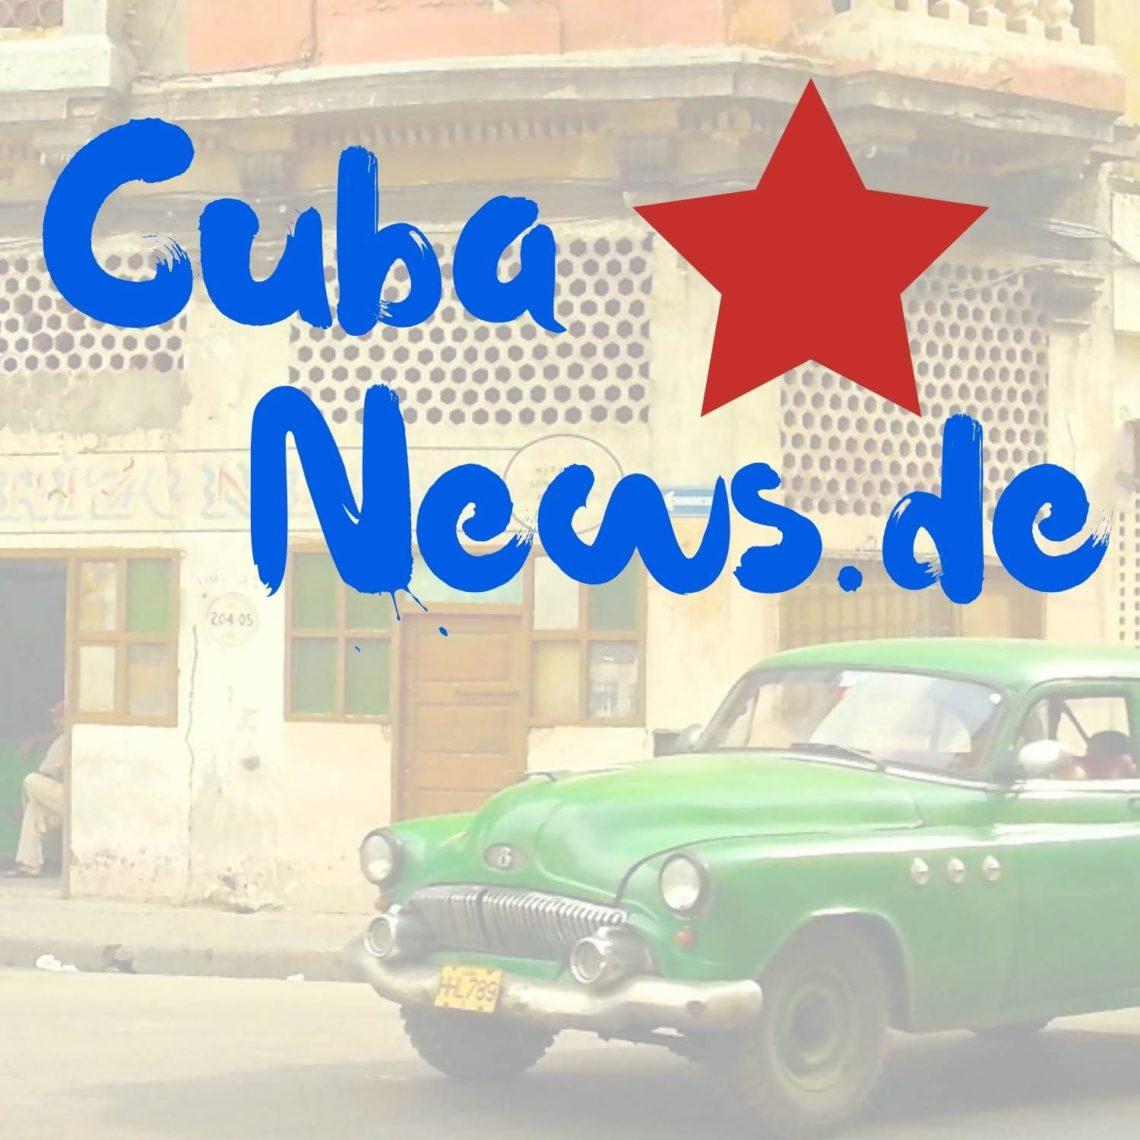 Logo des Cuba-Cast